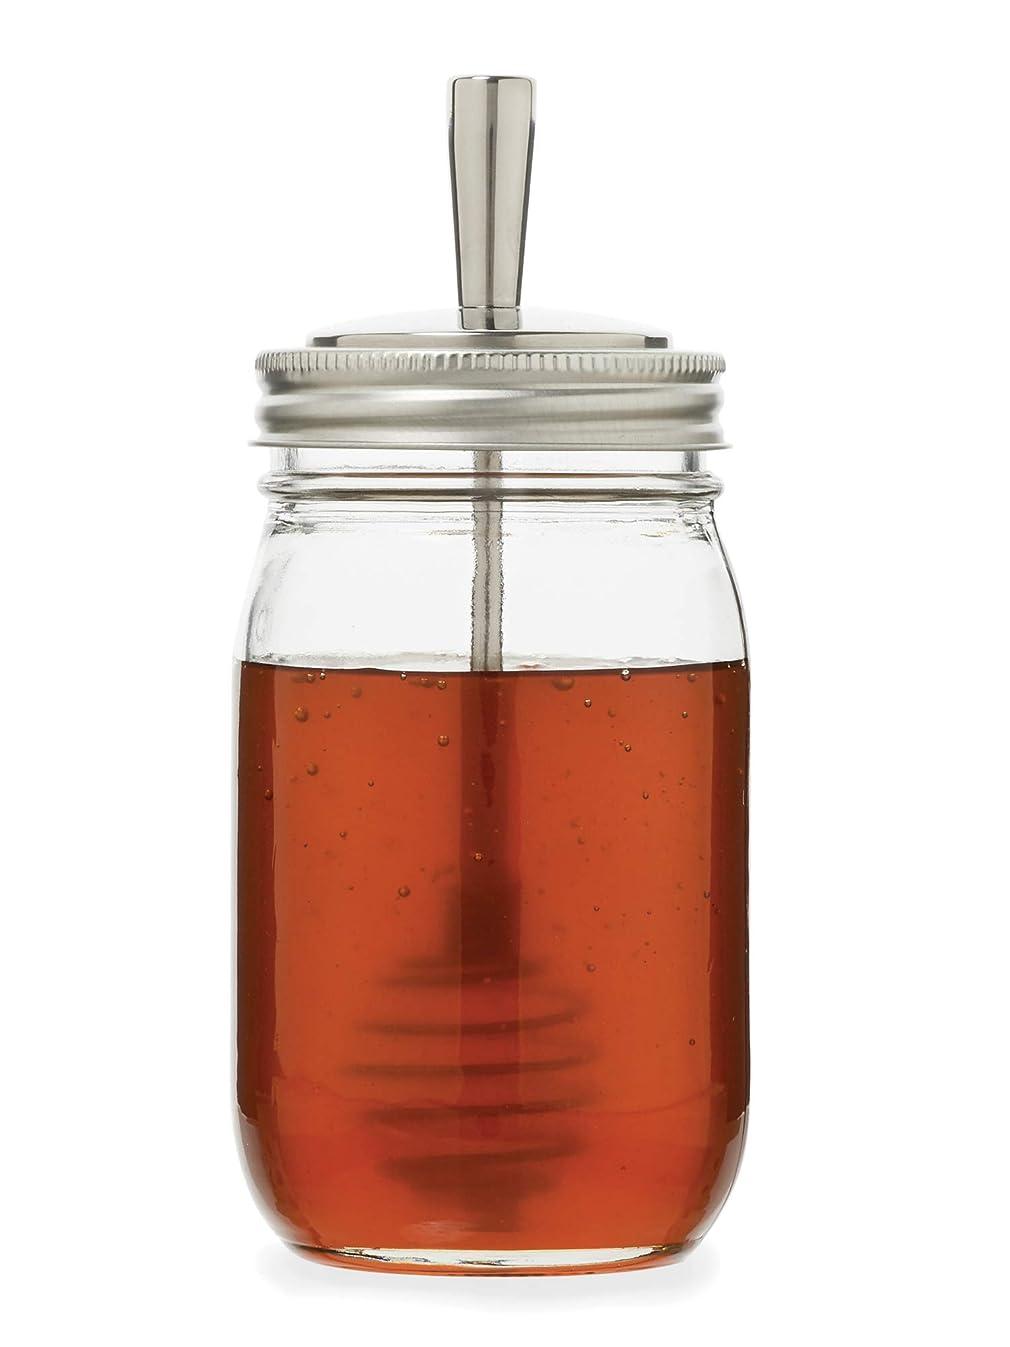 Jarware 82653 Metal Mason Jar Honey Dipper Lid, Regular Mouth, Stainless Steel